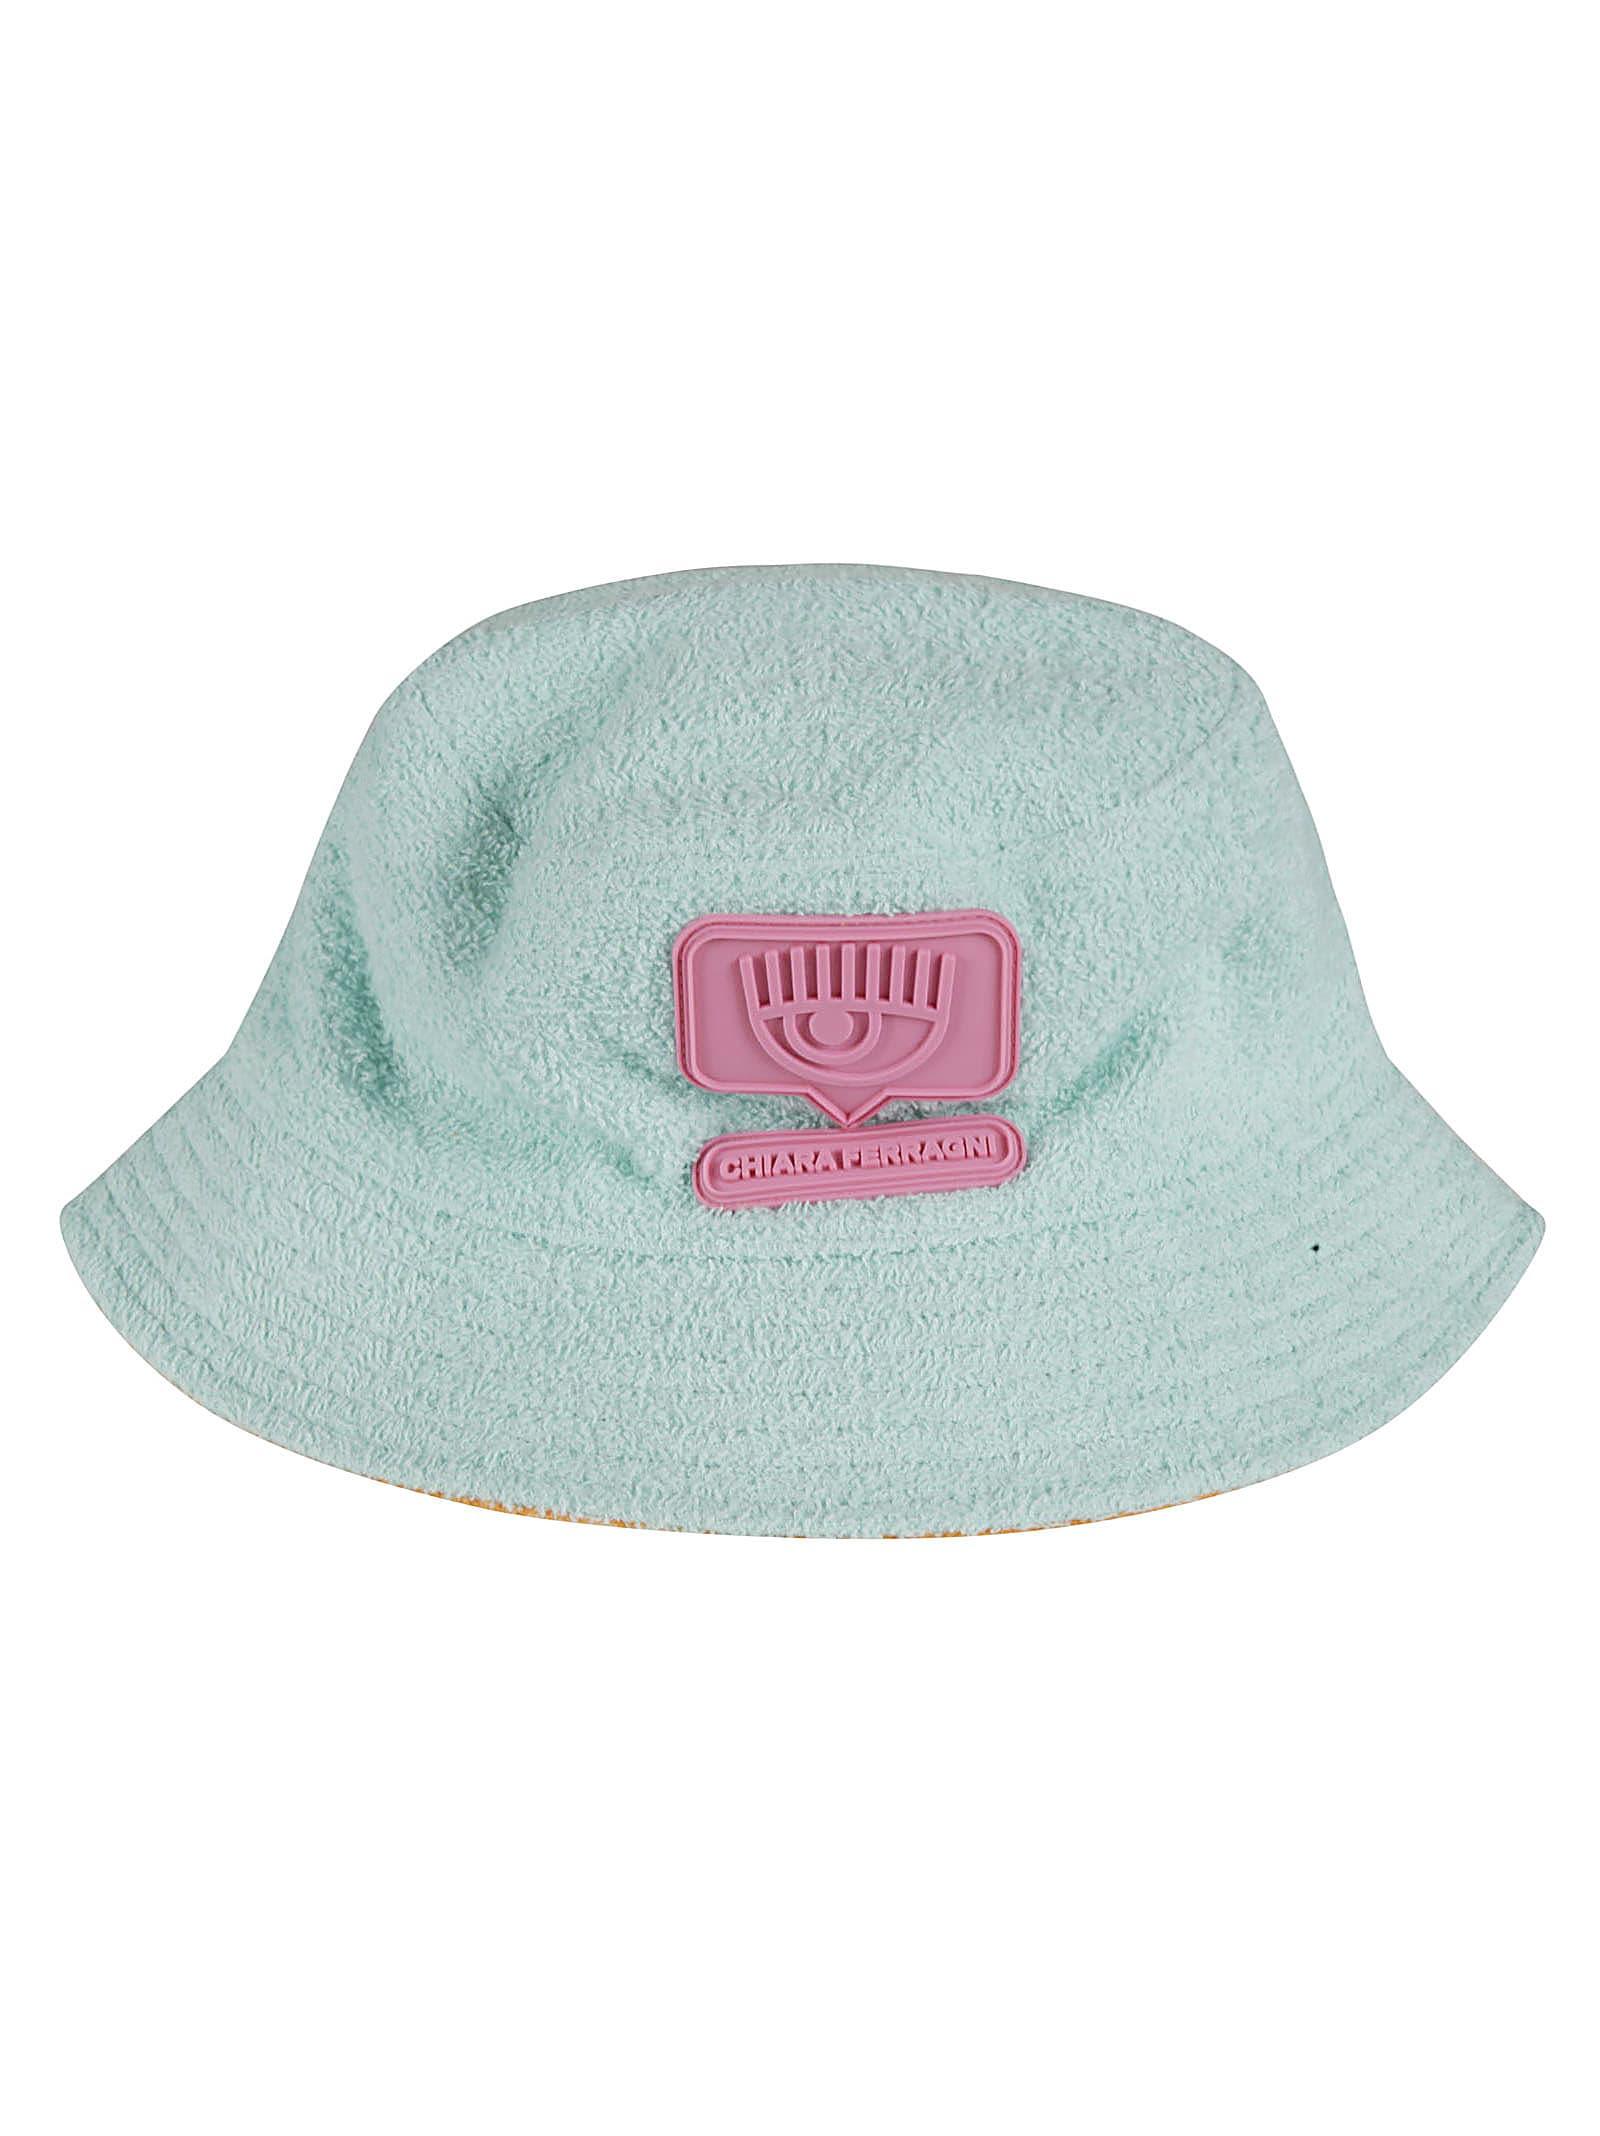 Chiara Ferragni Reversible Sponge Eyelike Hat